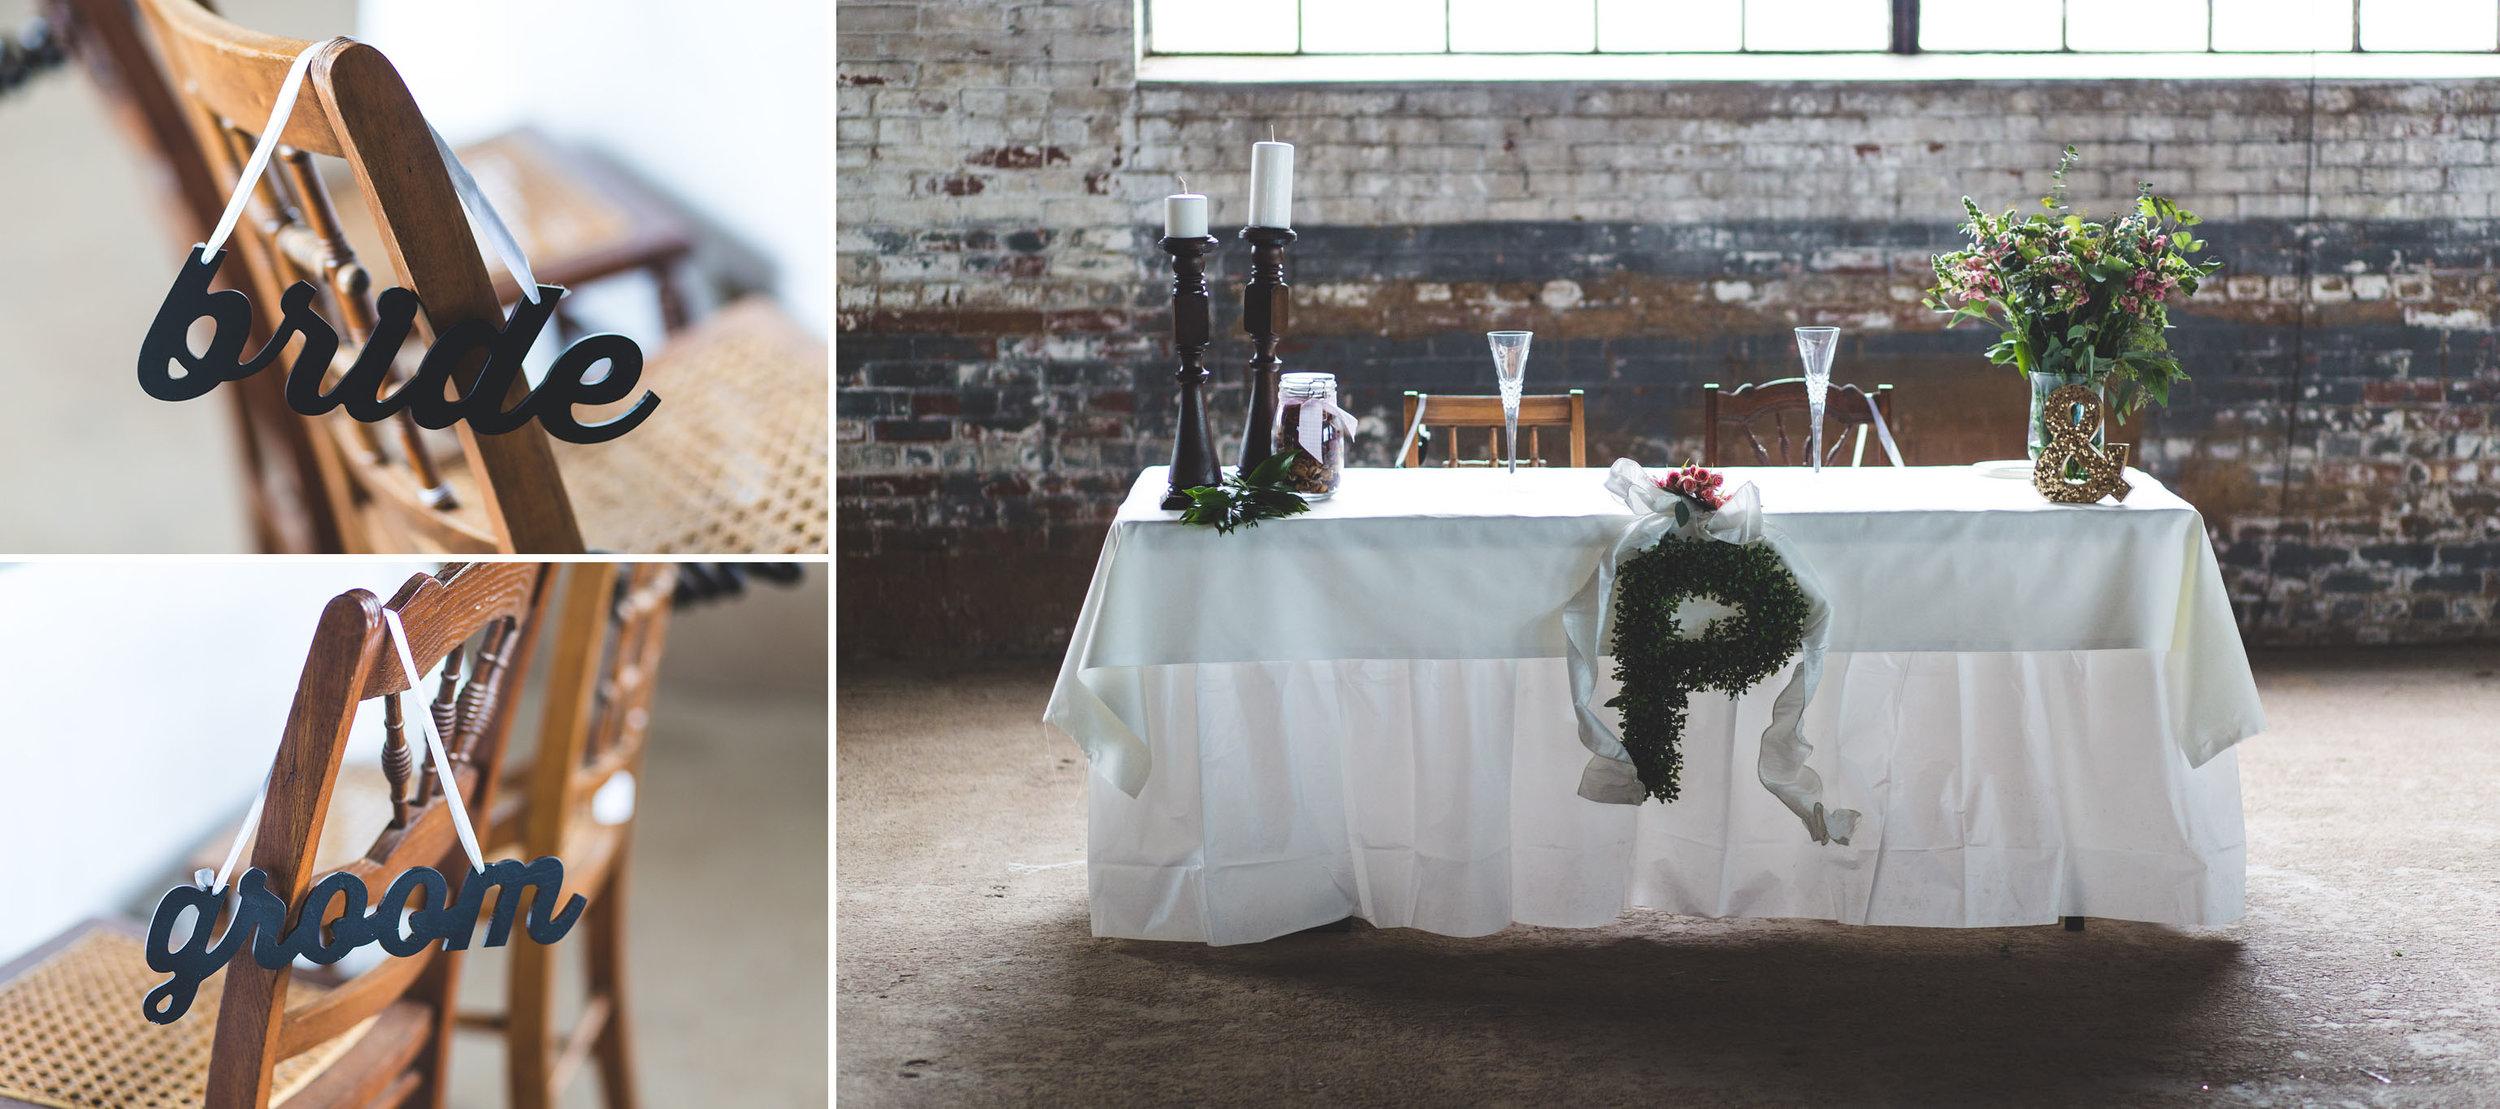 Adam-Szrmack-The-Glass-Factory-Wedding-8.jpg